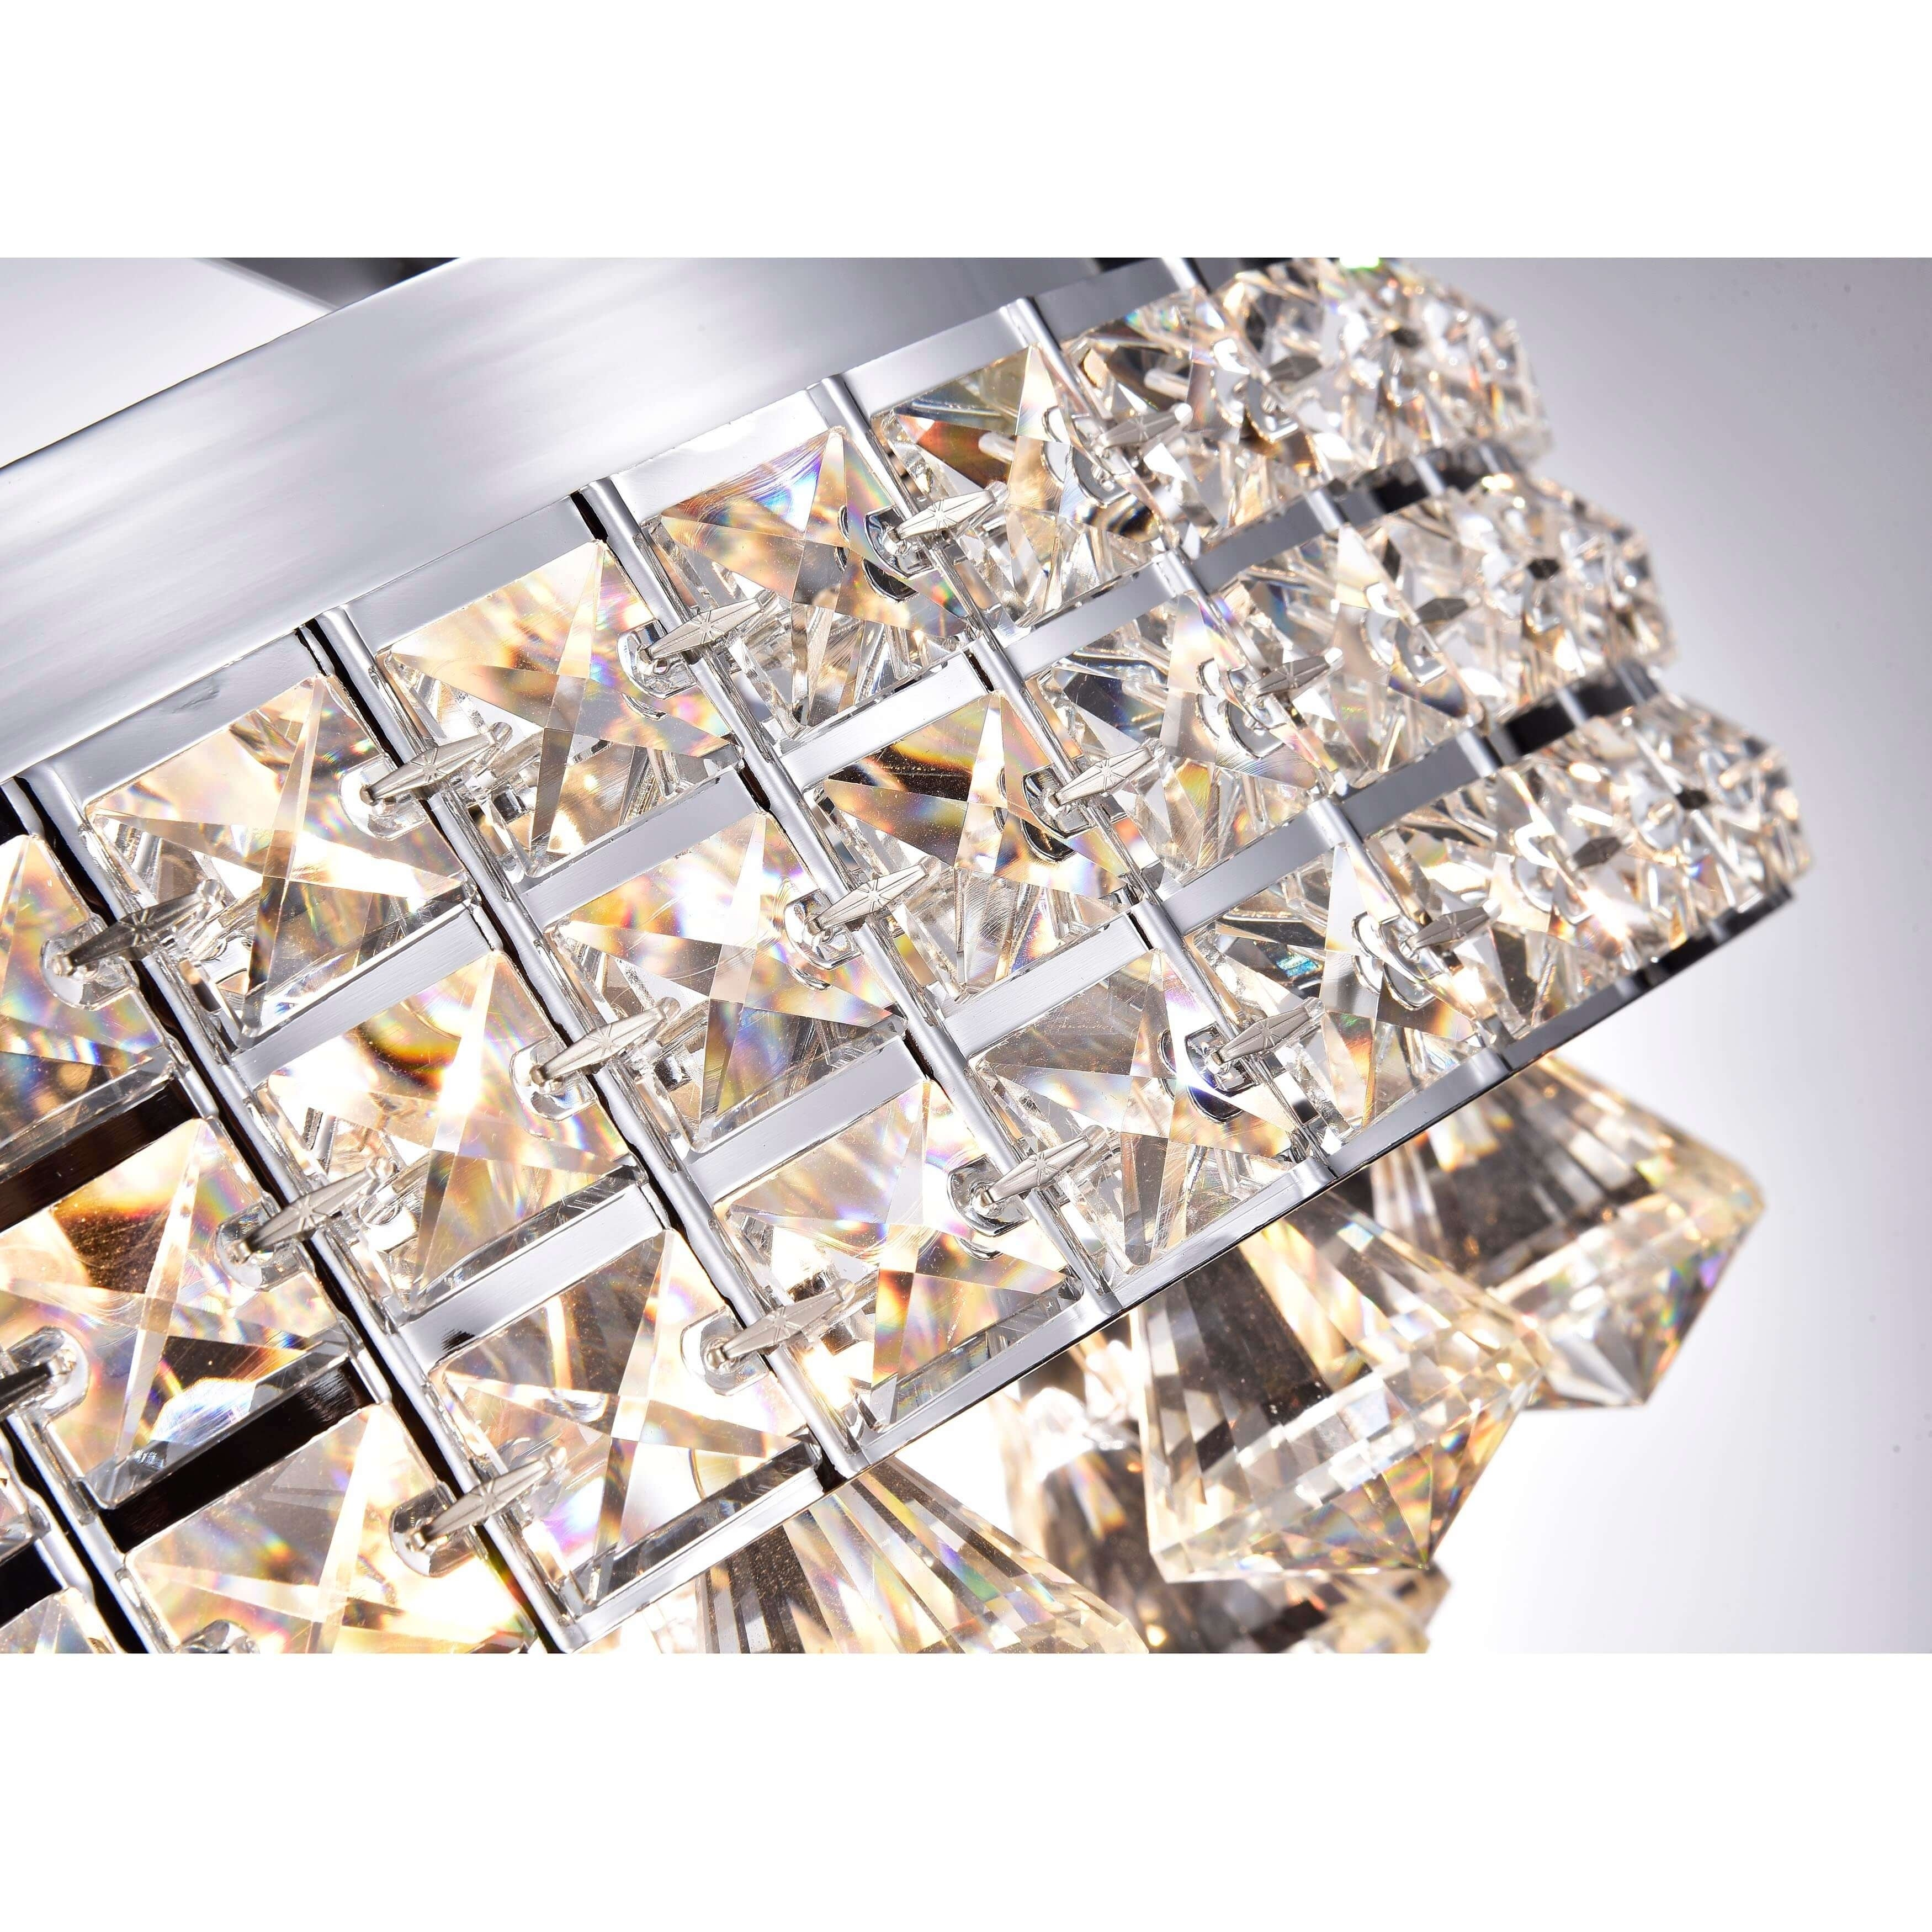 Antonia 4 light crystalchrome iron shade semi flush mount antonia 4 light crystalchrome iron shade semi flush mount chandelier free shipping today overstock 16404231 arubaitofo Gallery